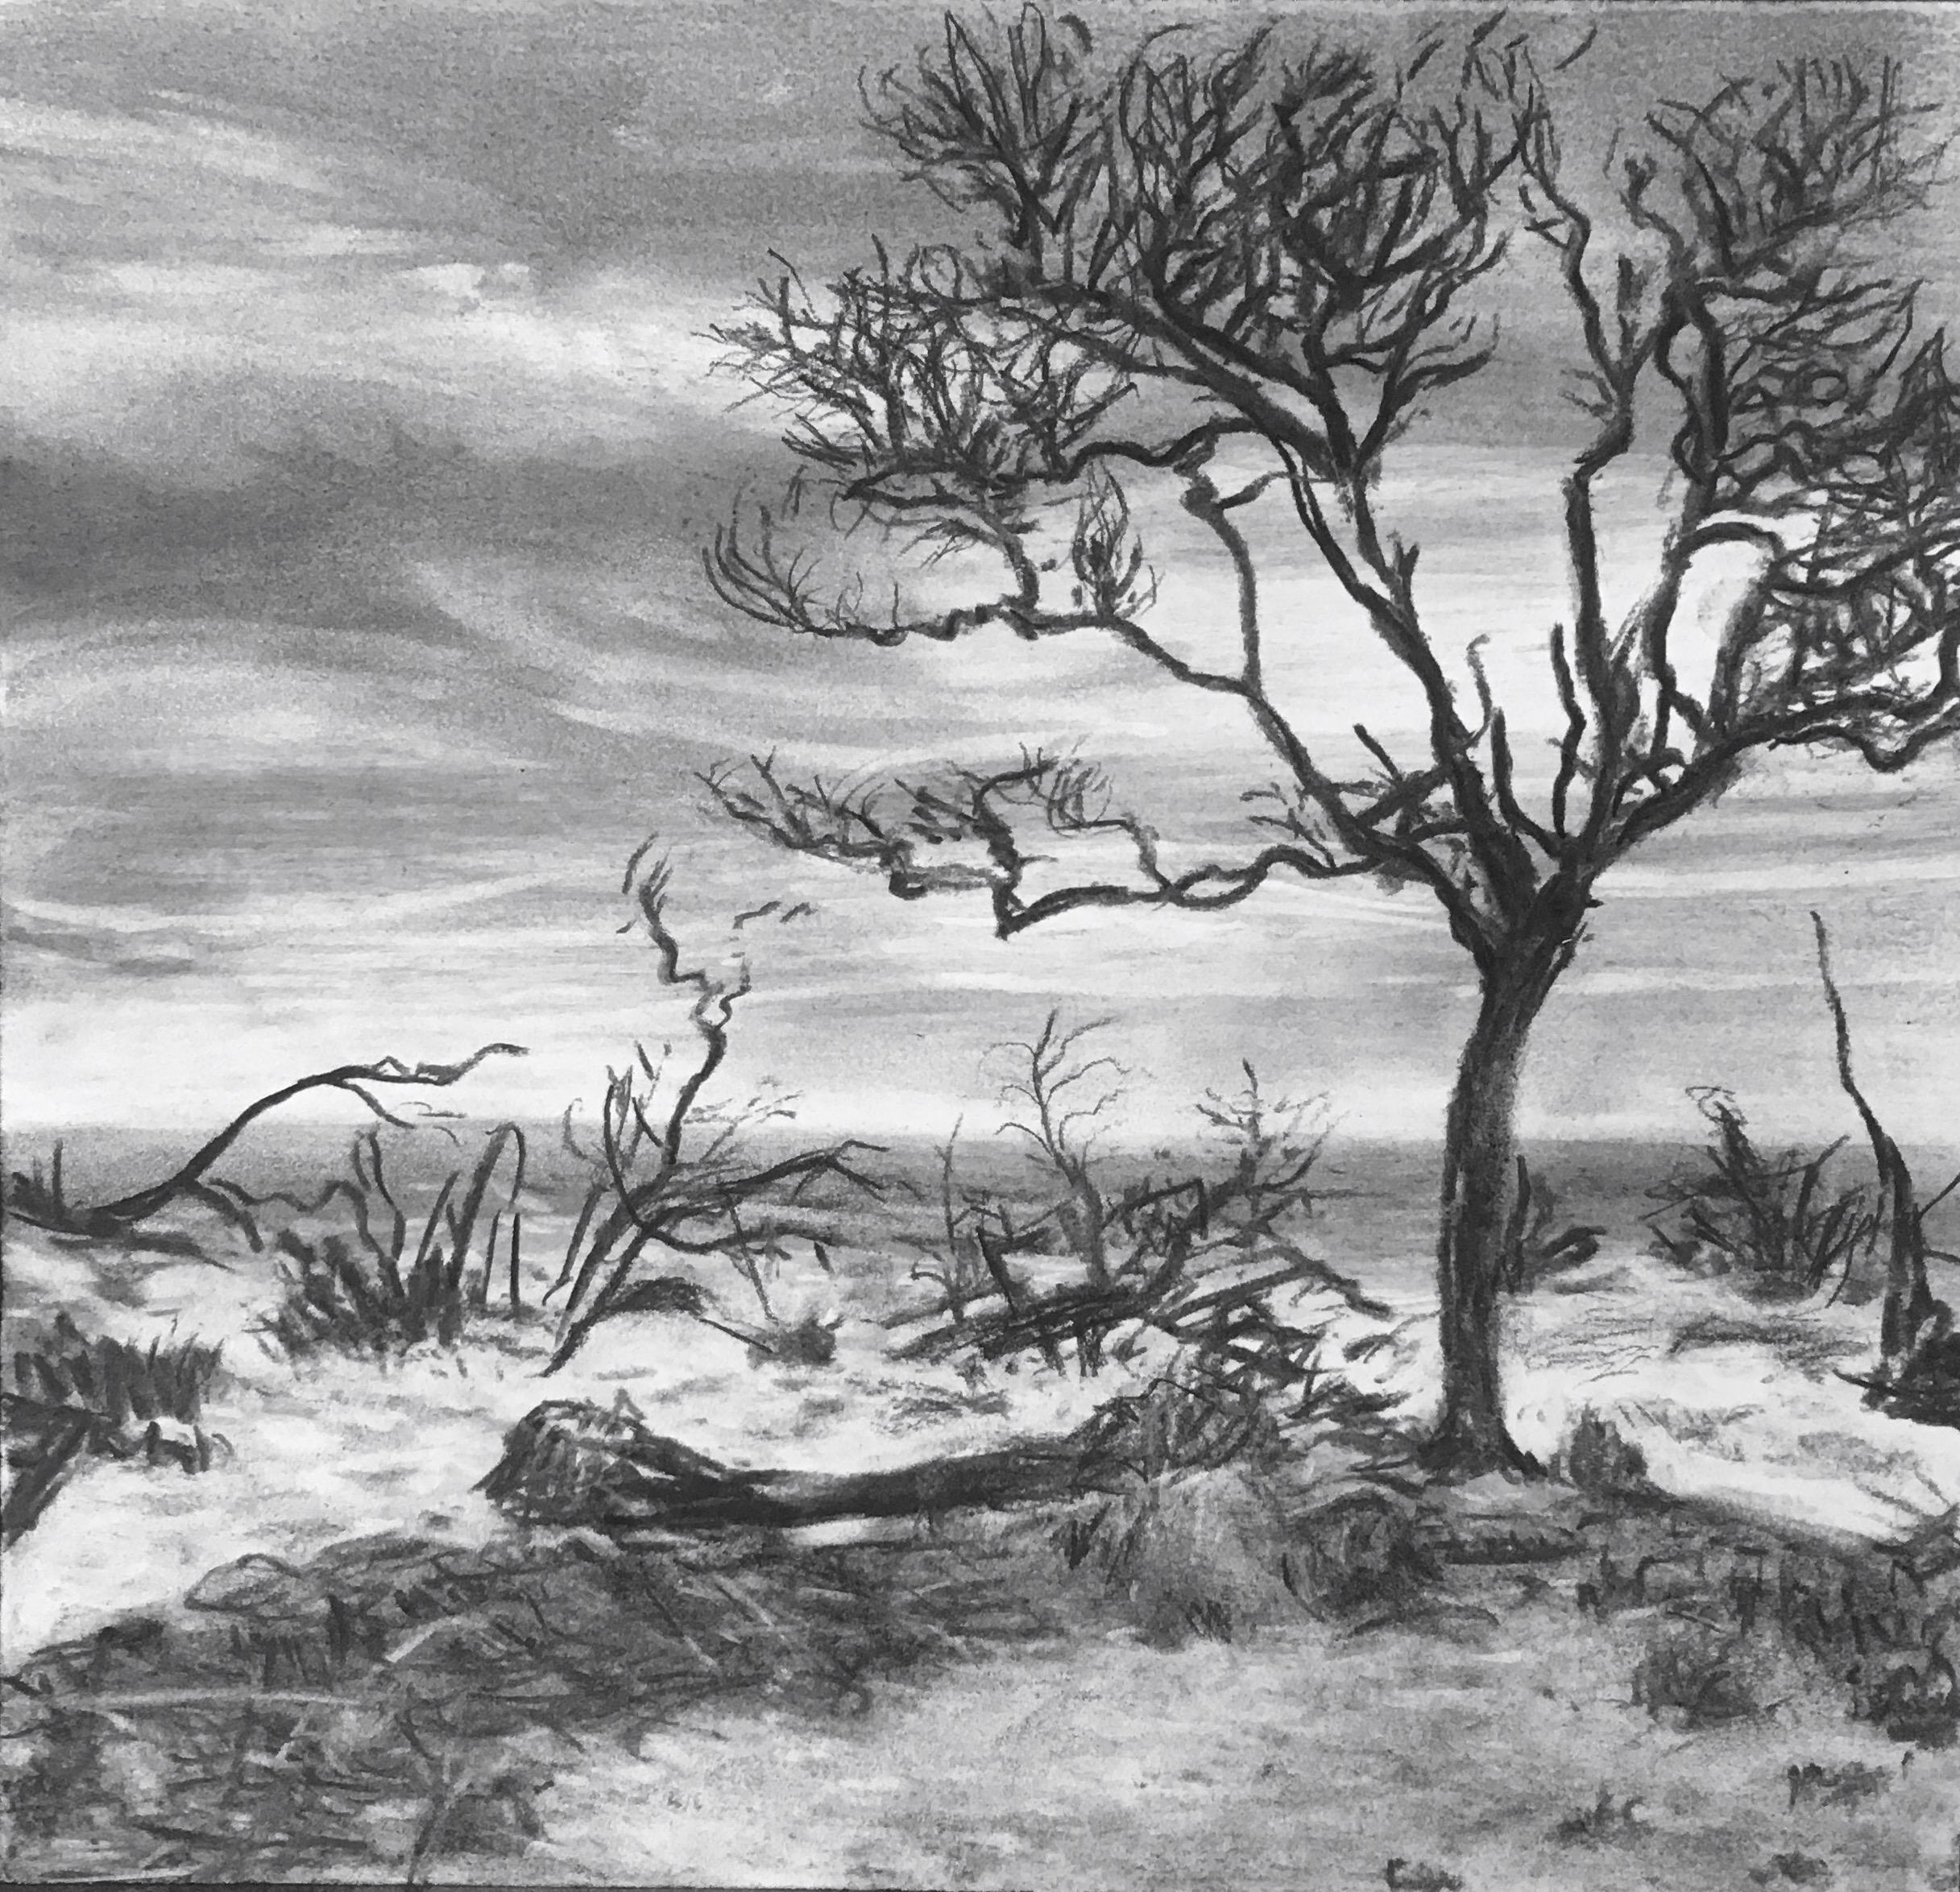 Hunting Island, SC: Debris – Allen Bannister